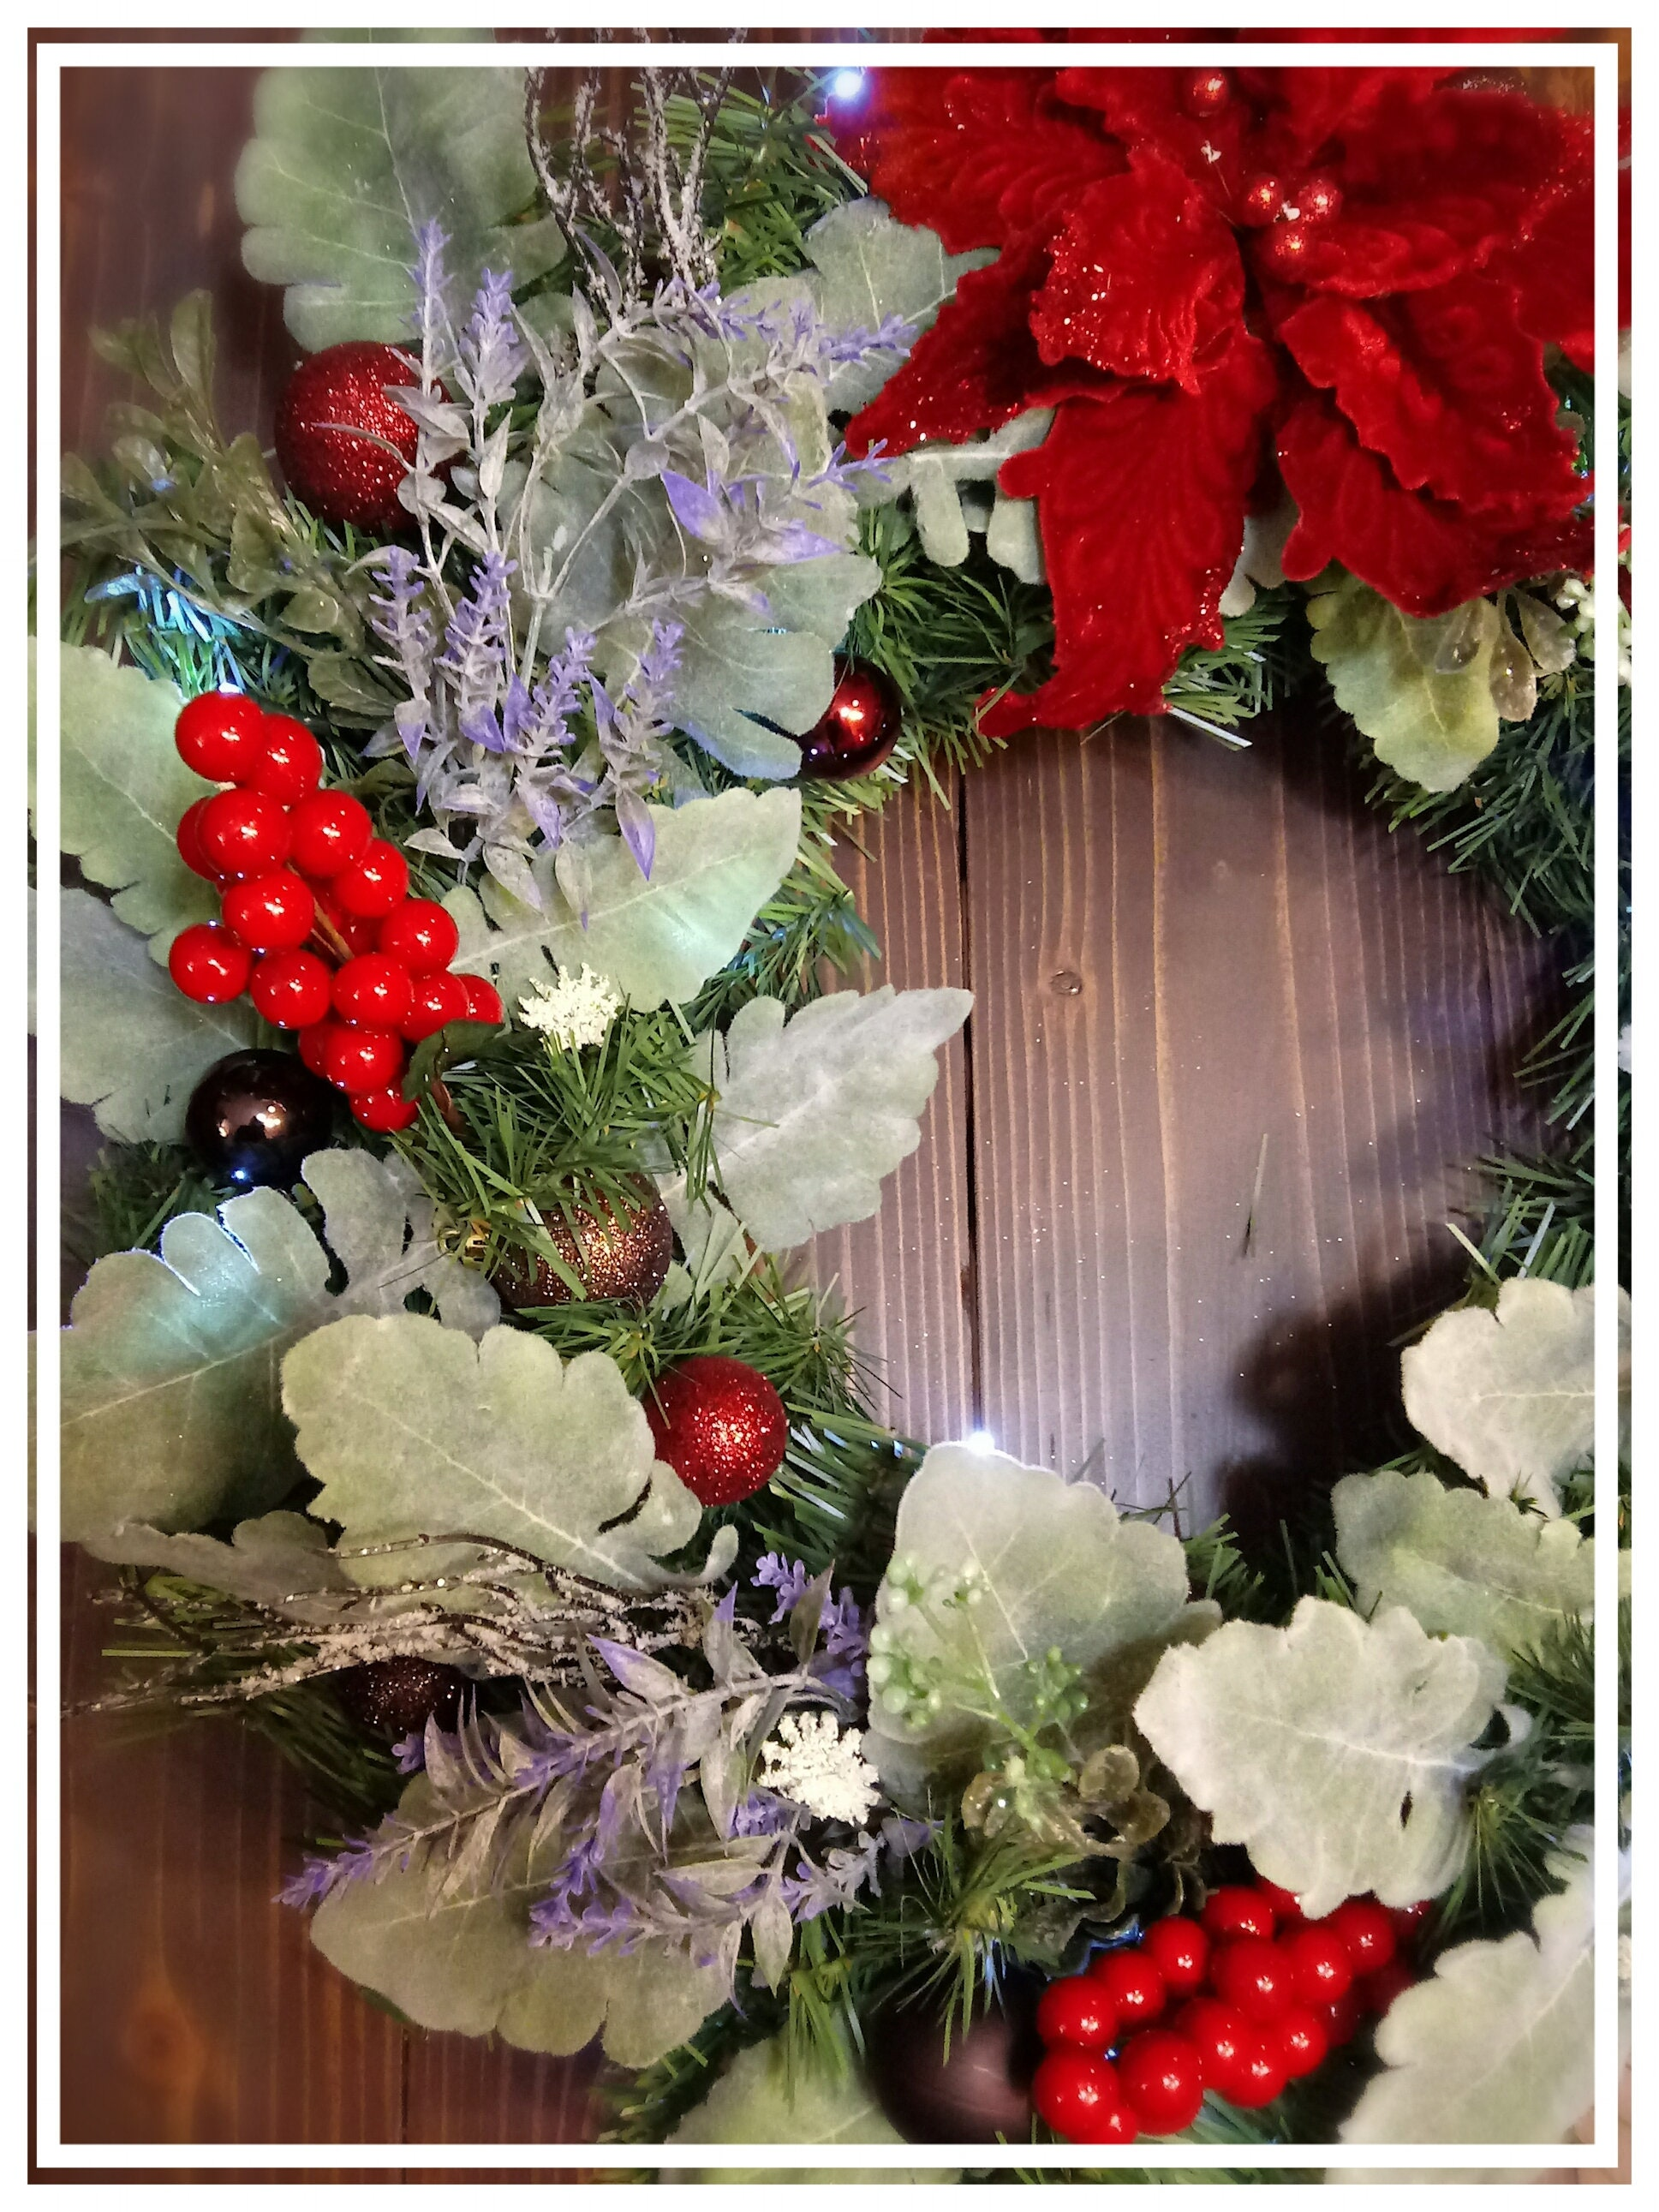 Christmas Woodlands Lighted Christmas Wreath Door Wreath